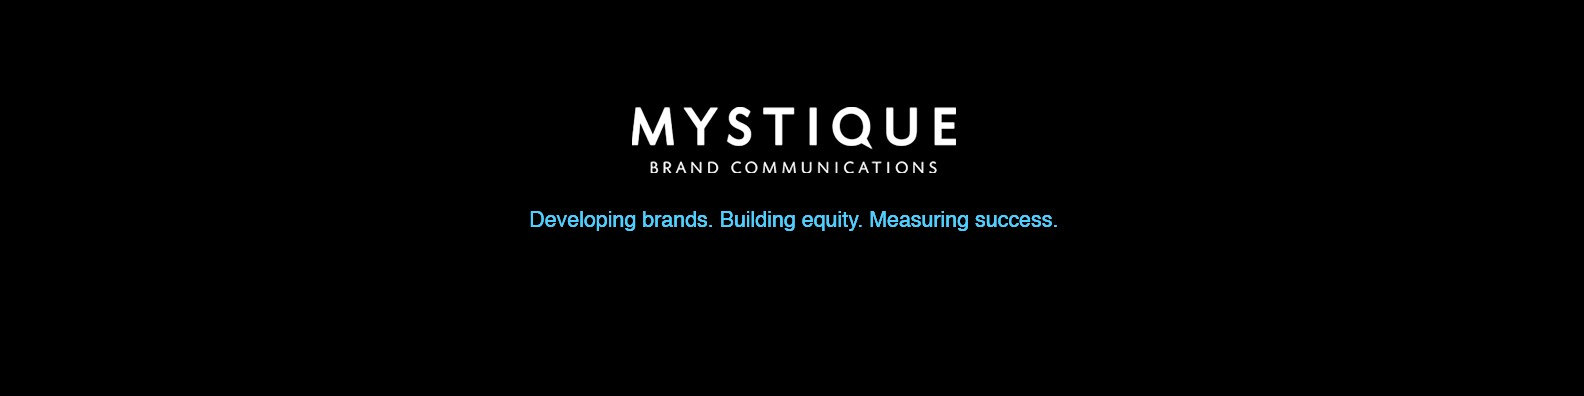 Mystique Brand Communications